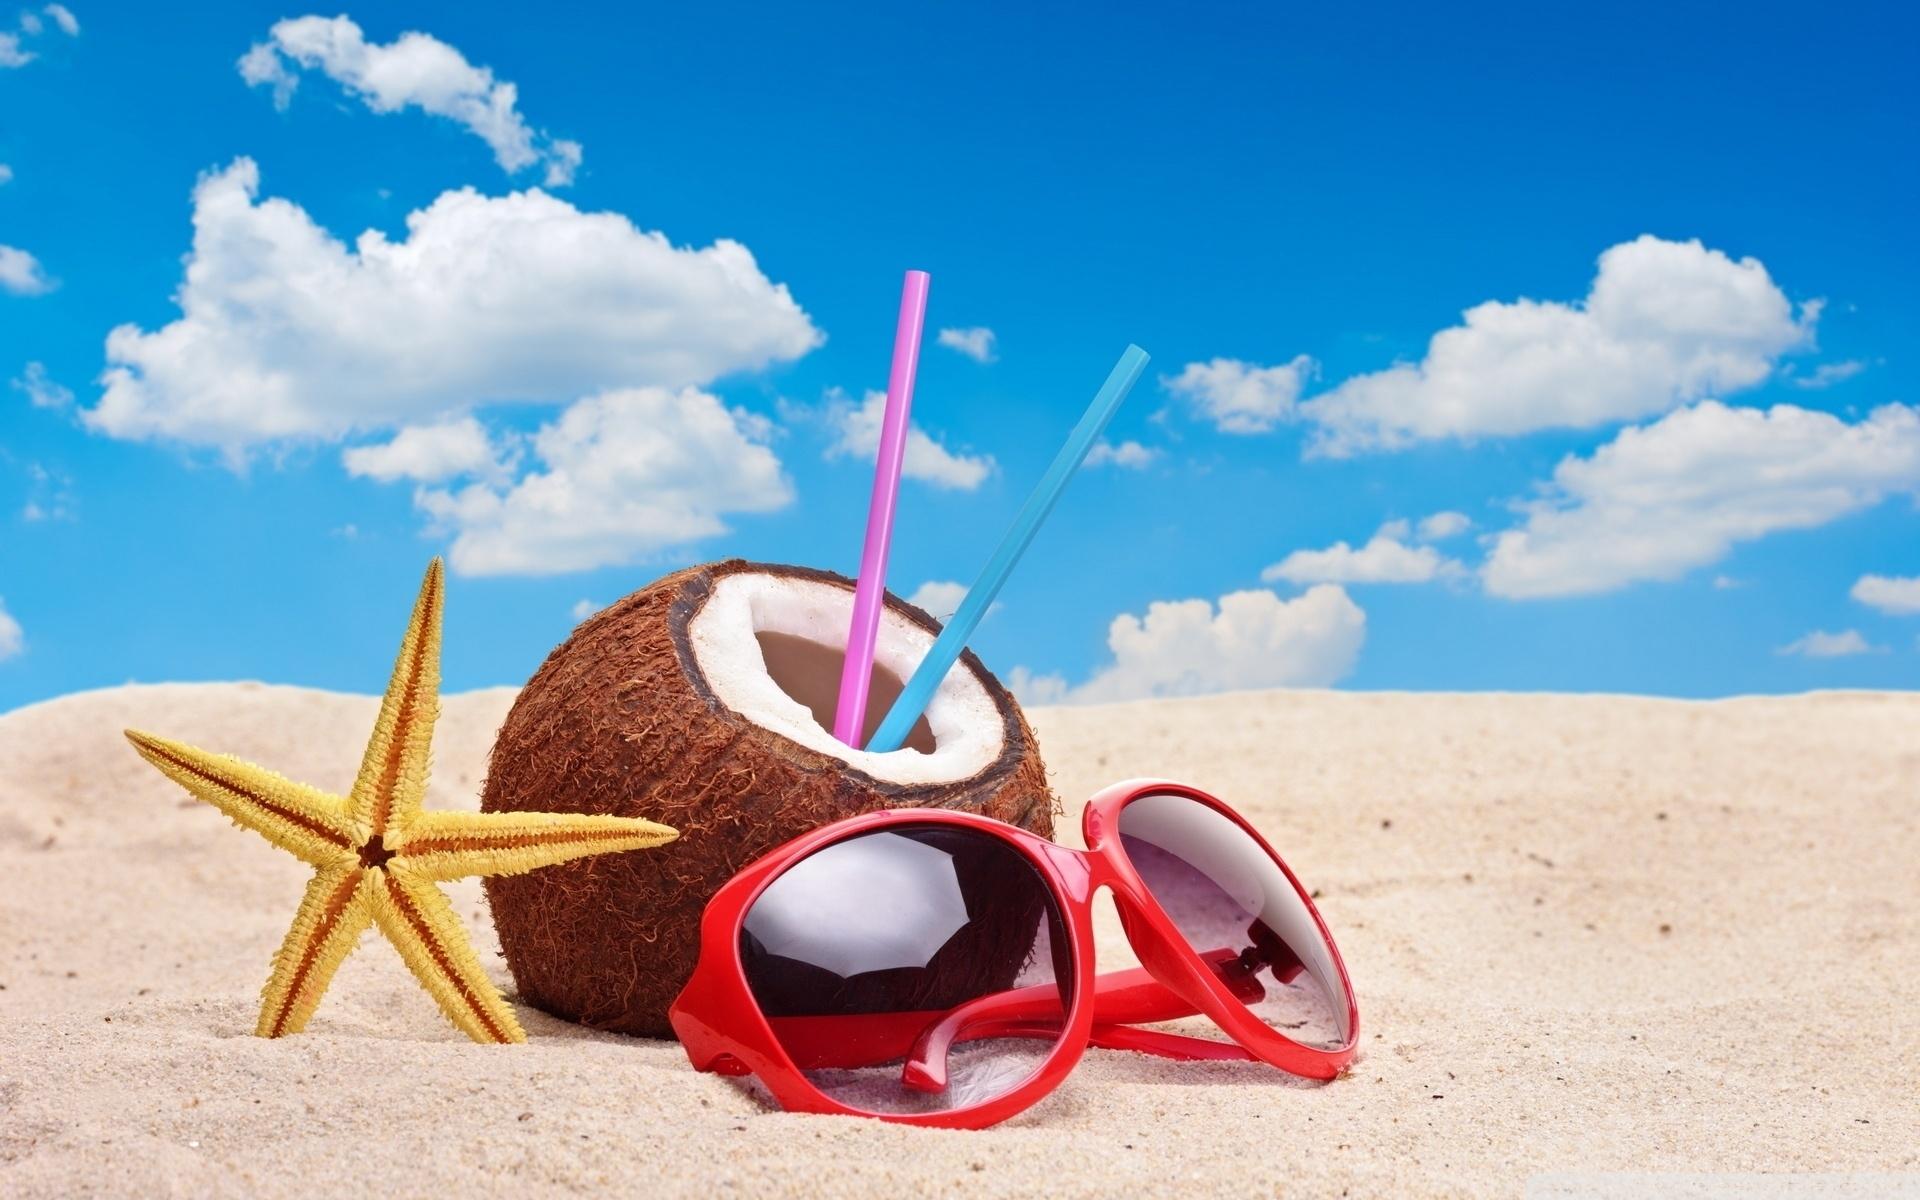 summer beach ❤ 4k hd desktop wallpaper for 4k ultra hd tv • tablet